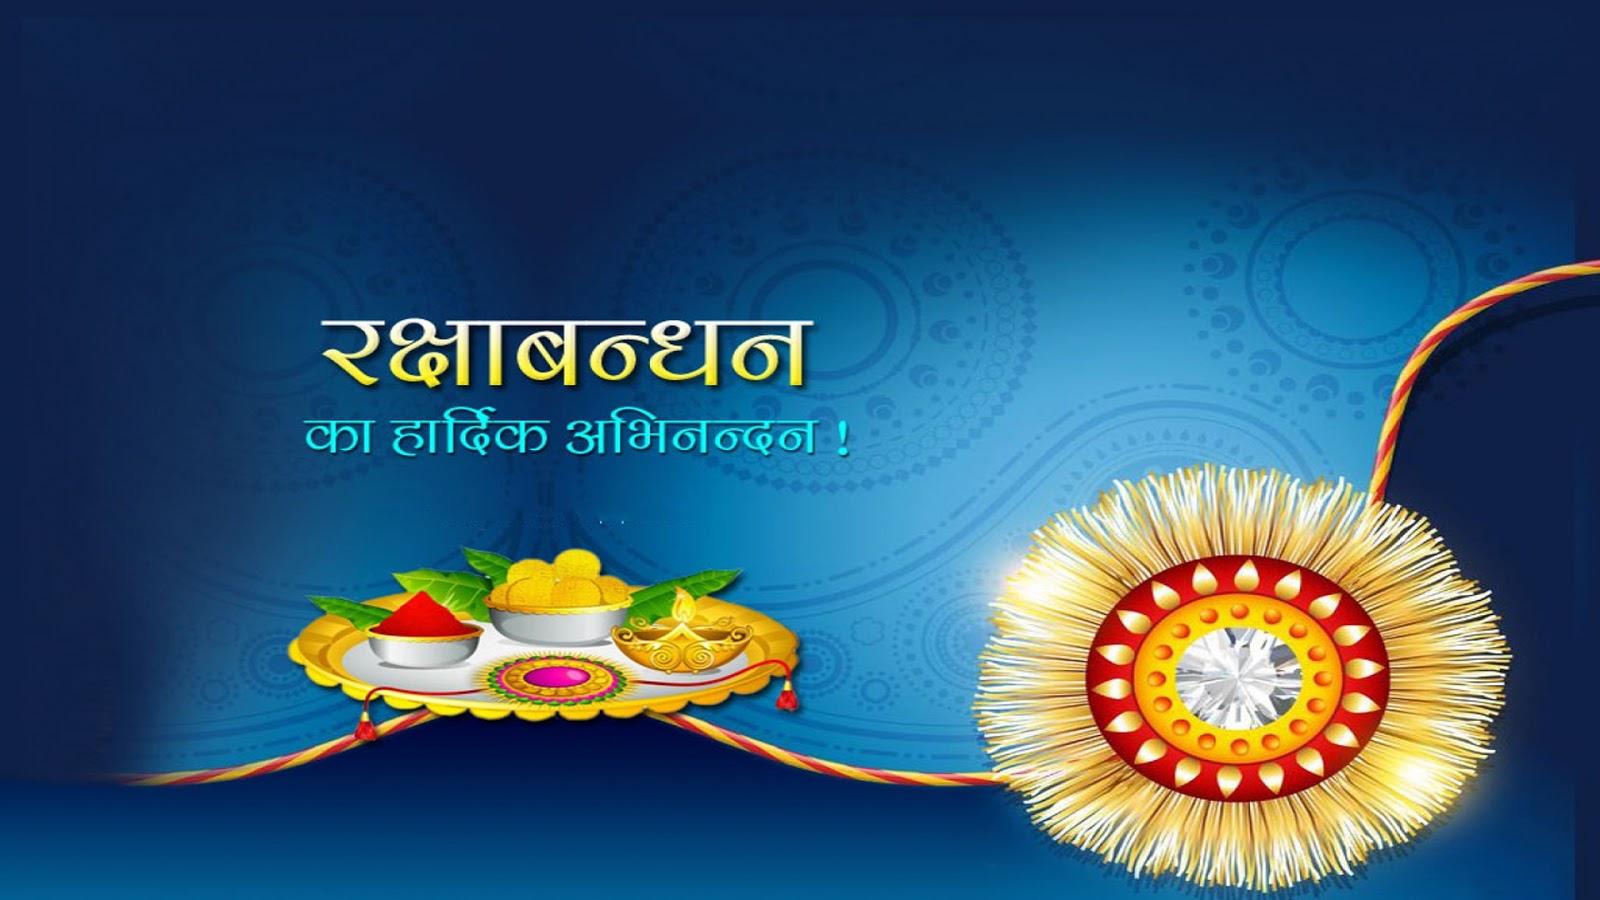 Raksha Bandhan Greetings Card Ecards And Cliparts For Brother And